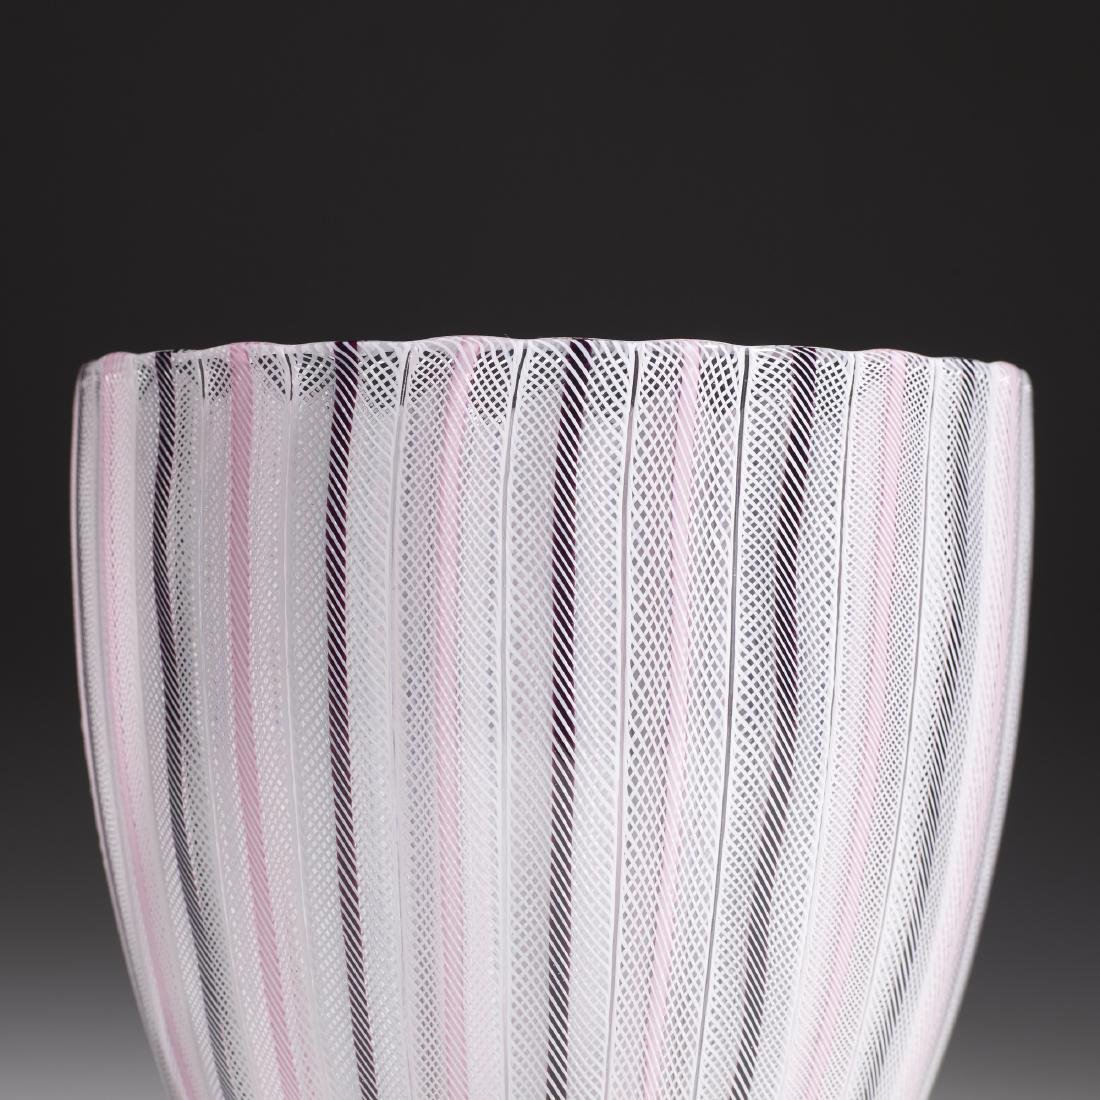 Paolo Venini, Zanfirico vase, model 3784 - 2